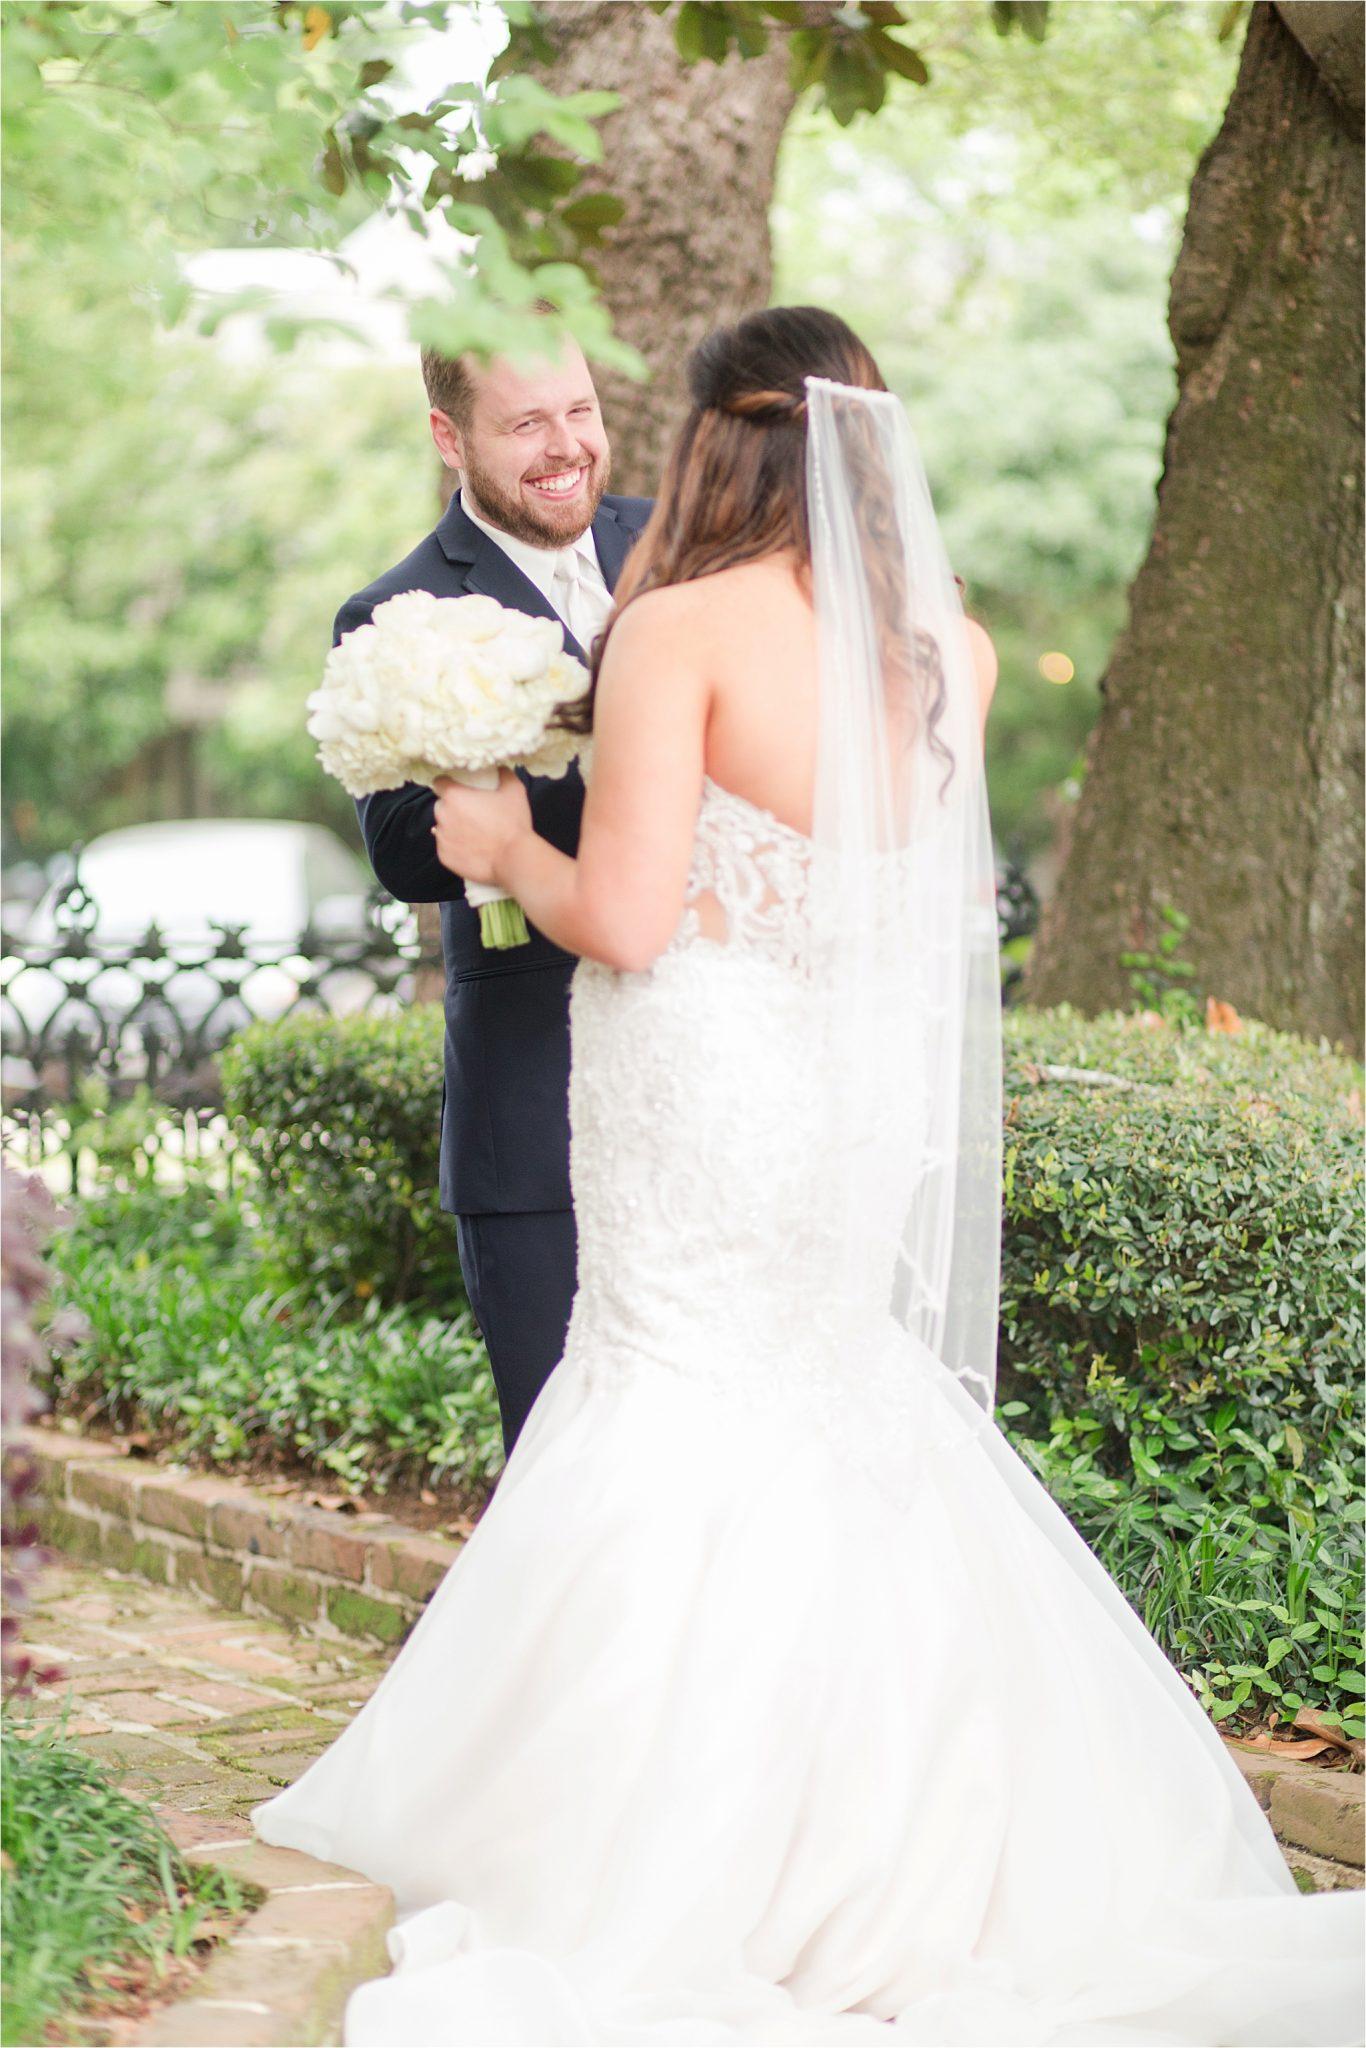 first look-bride and groom-mermaid dress-wedding moments-